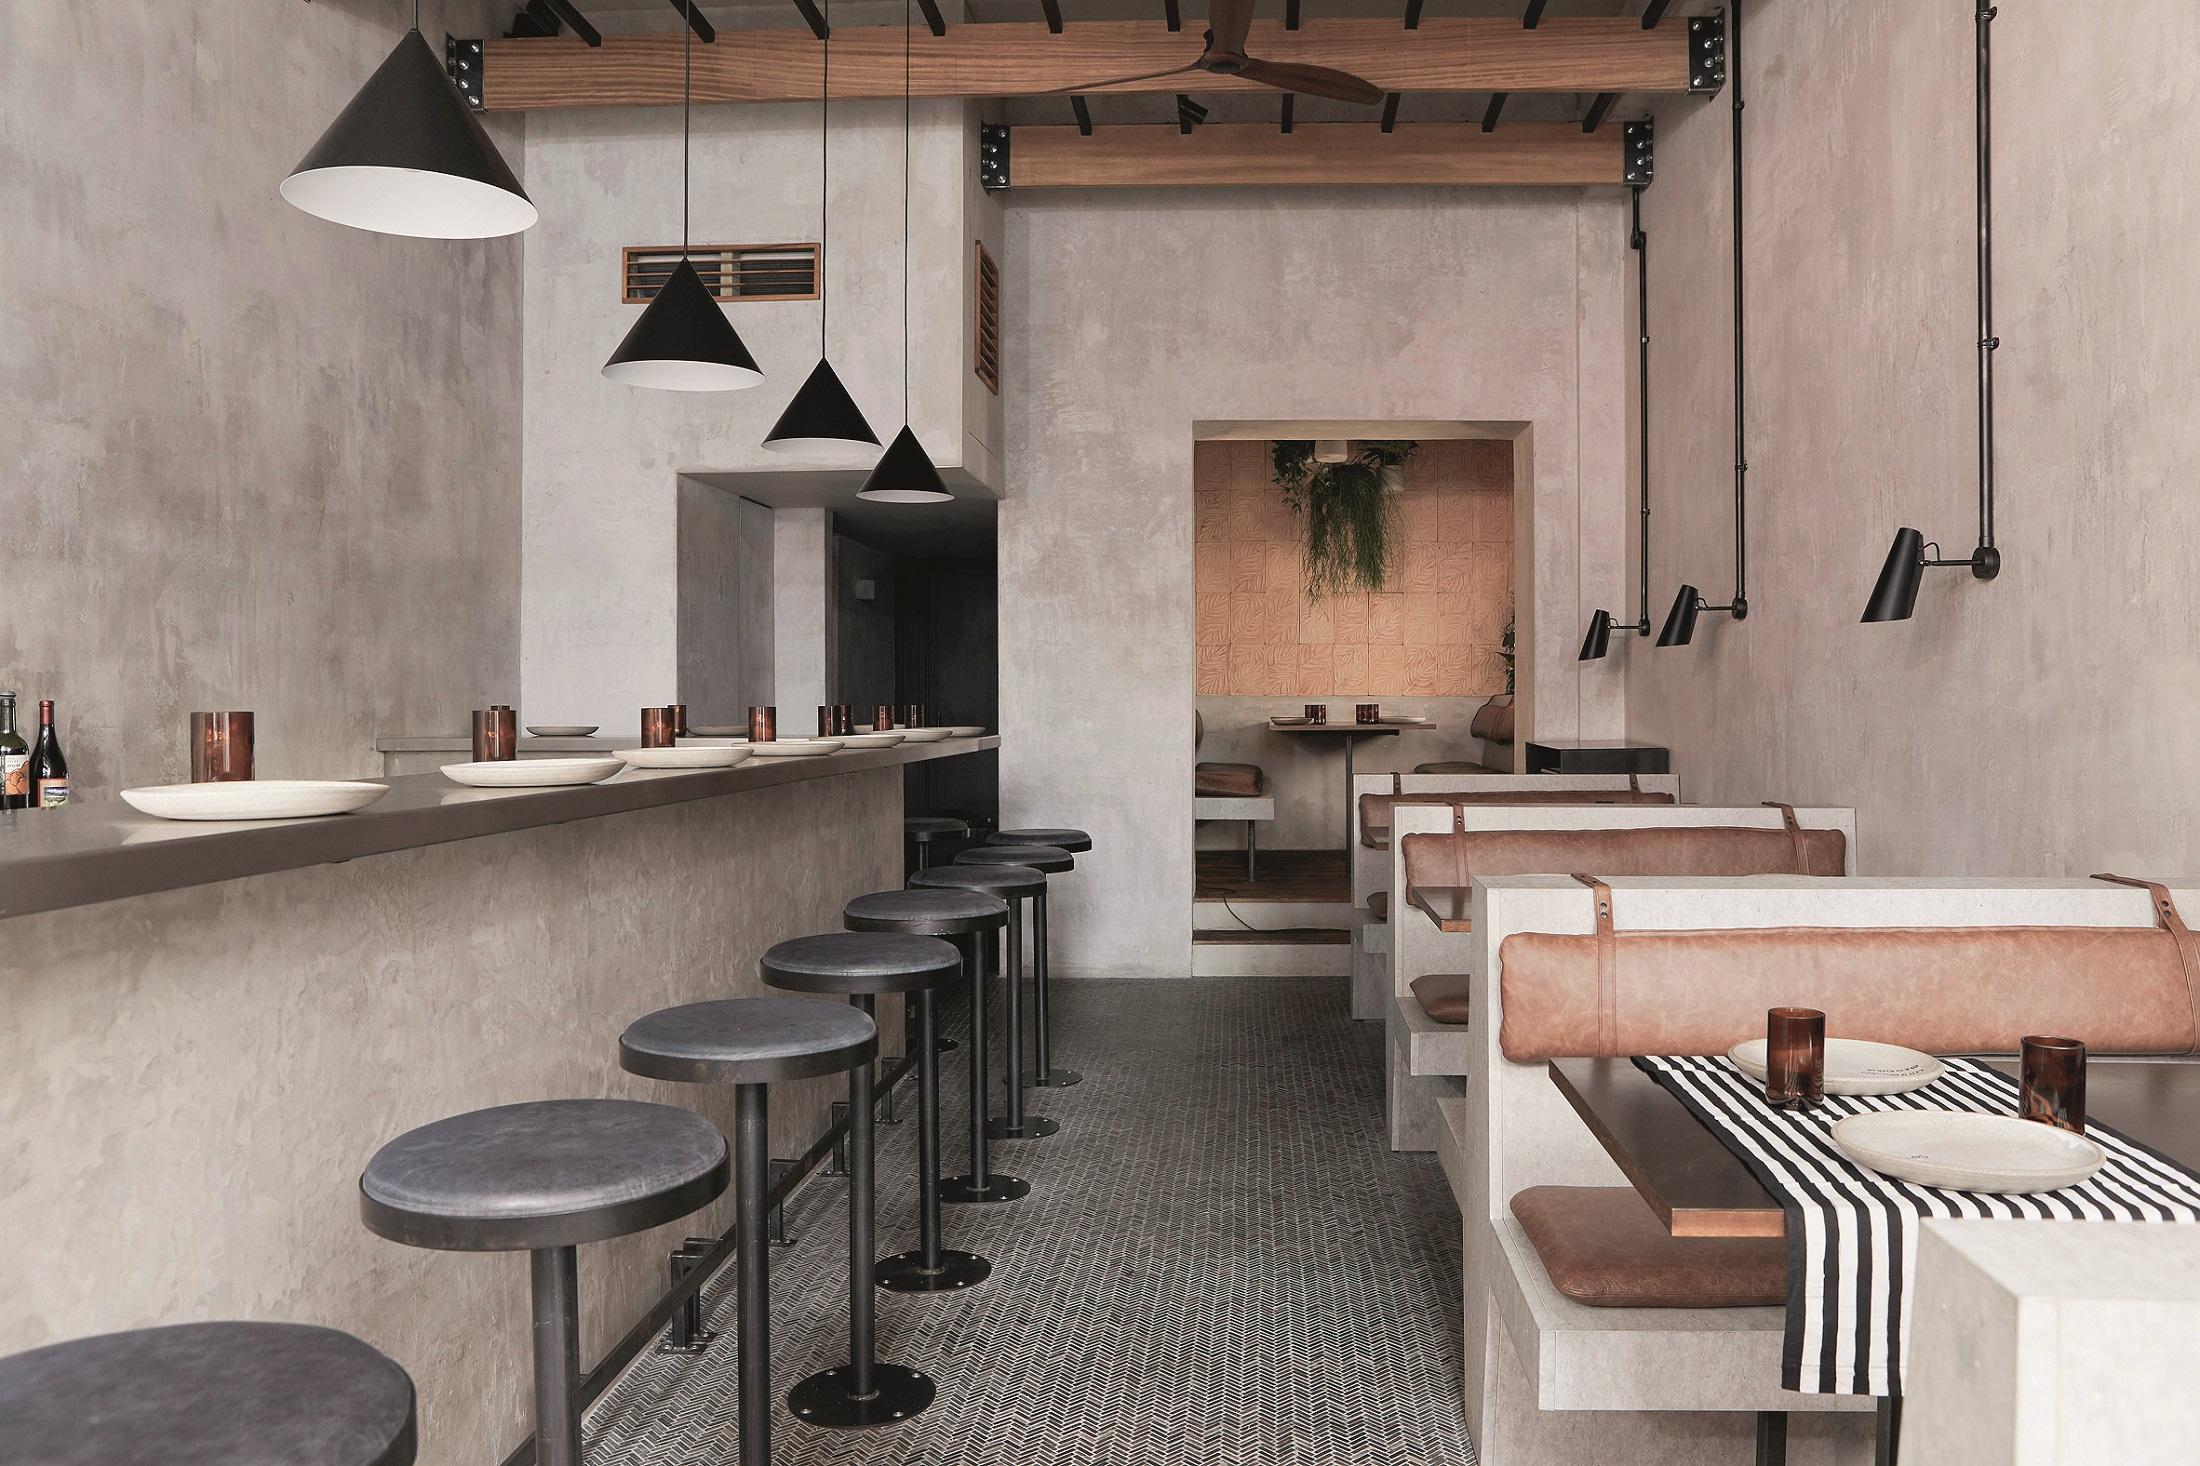 Dan Preston Studio - Paradise - interijer šrilankanskog restorana u Londonu nadahnut brutalizmom